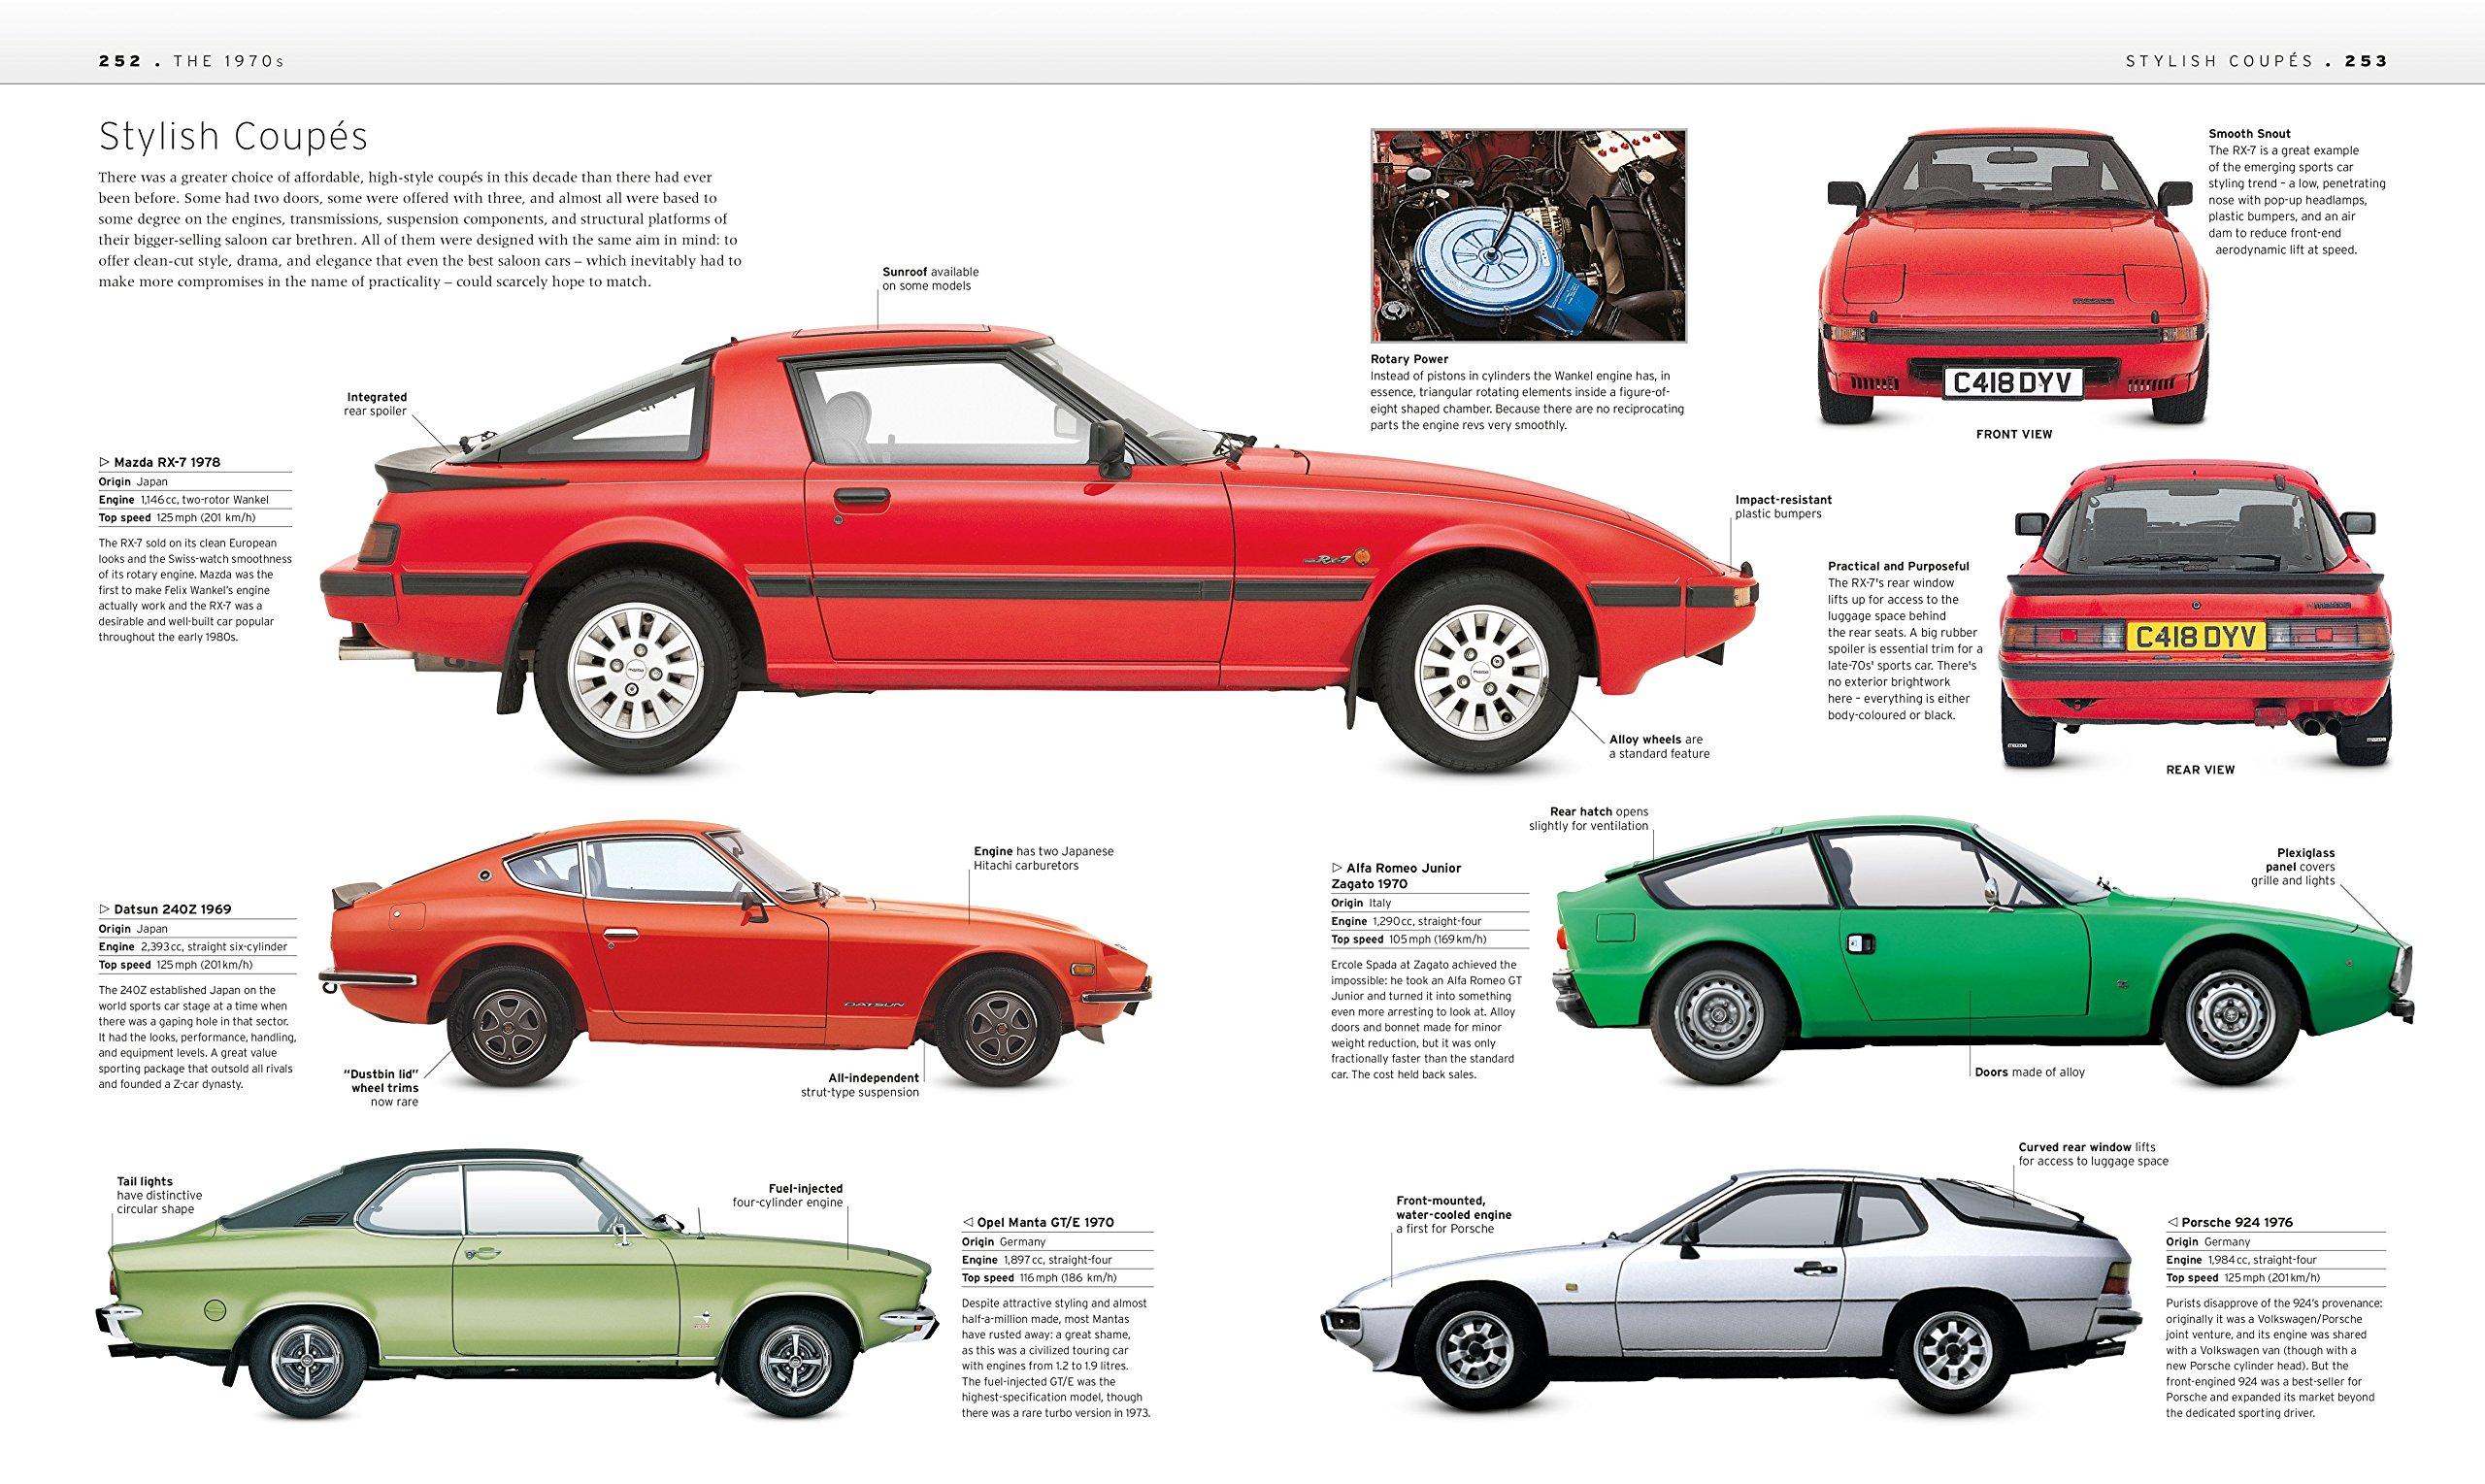 The Classic Car Book (Dk): Amazon.es: Anónimo: Libros en idiomas extranjeros